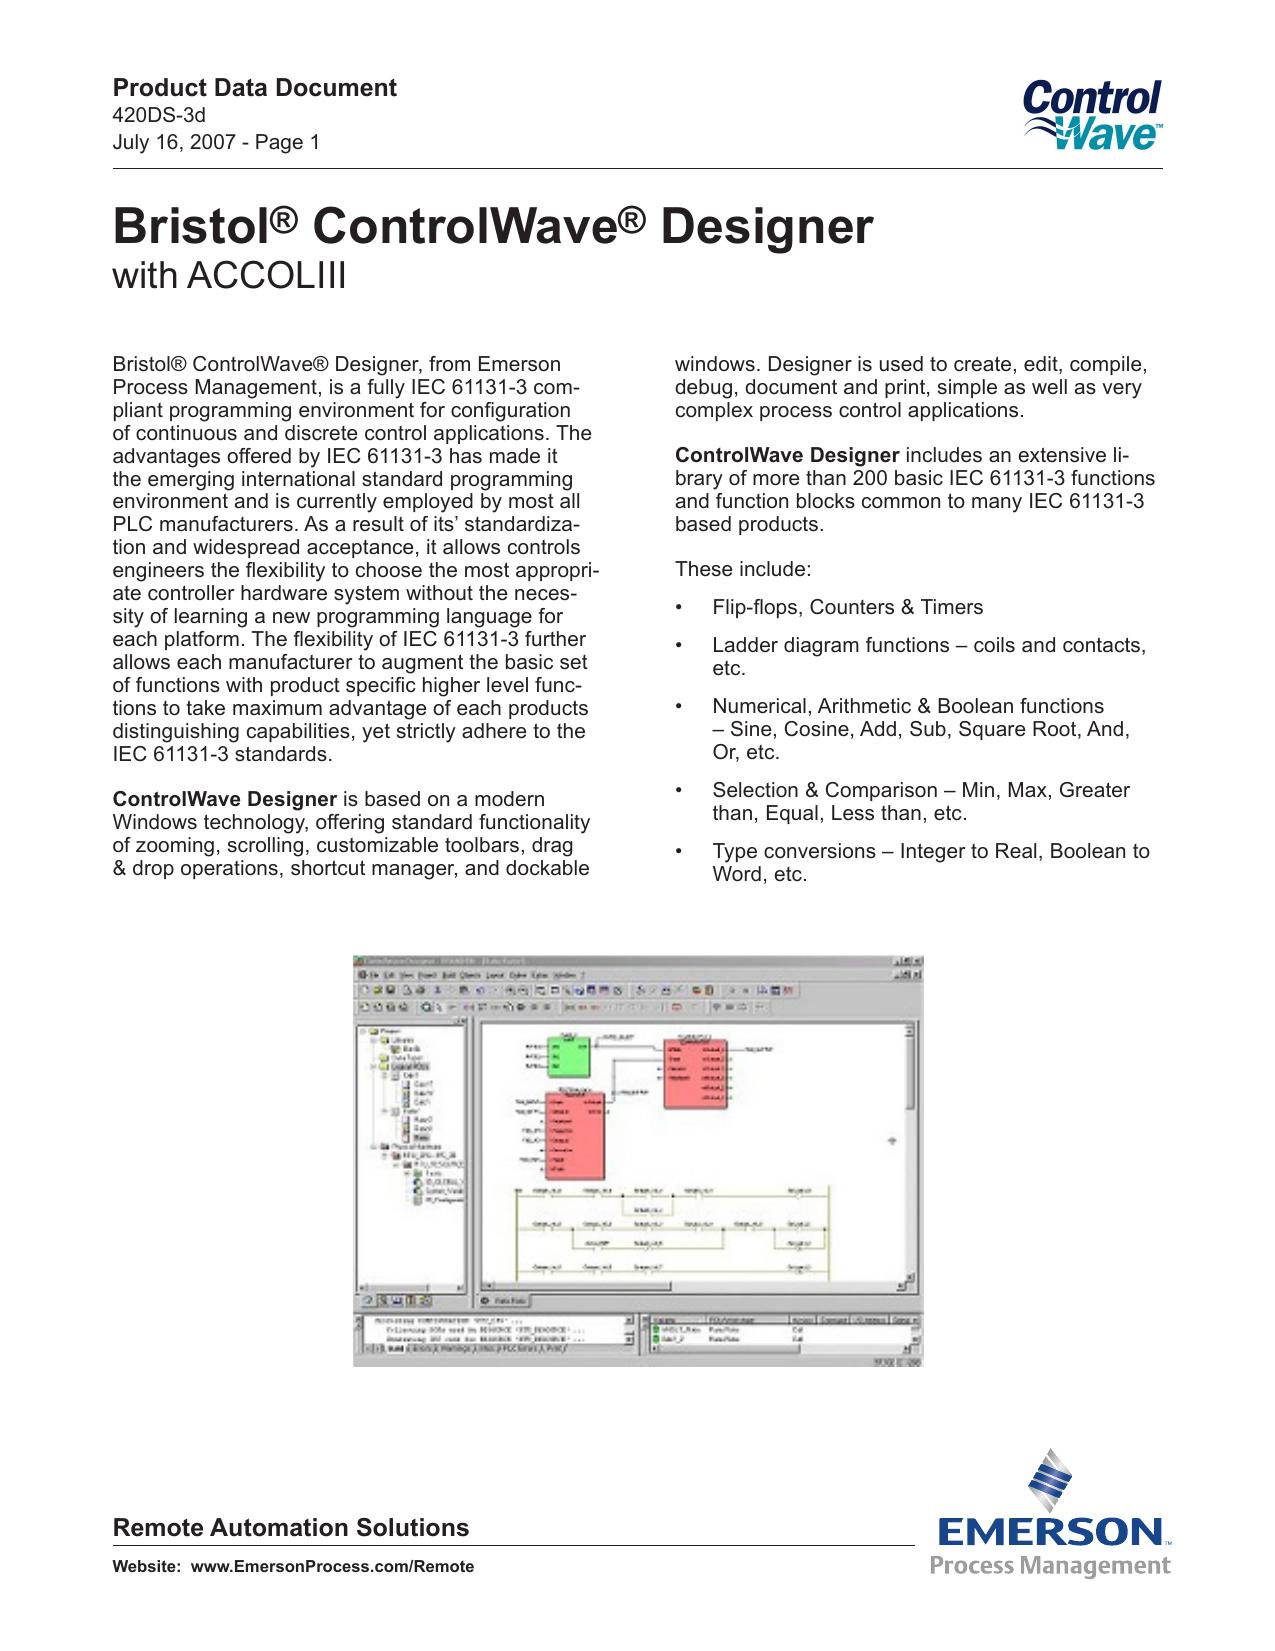 Bristol® ControlWave® Designer | manualzz com